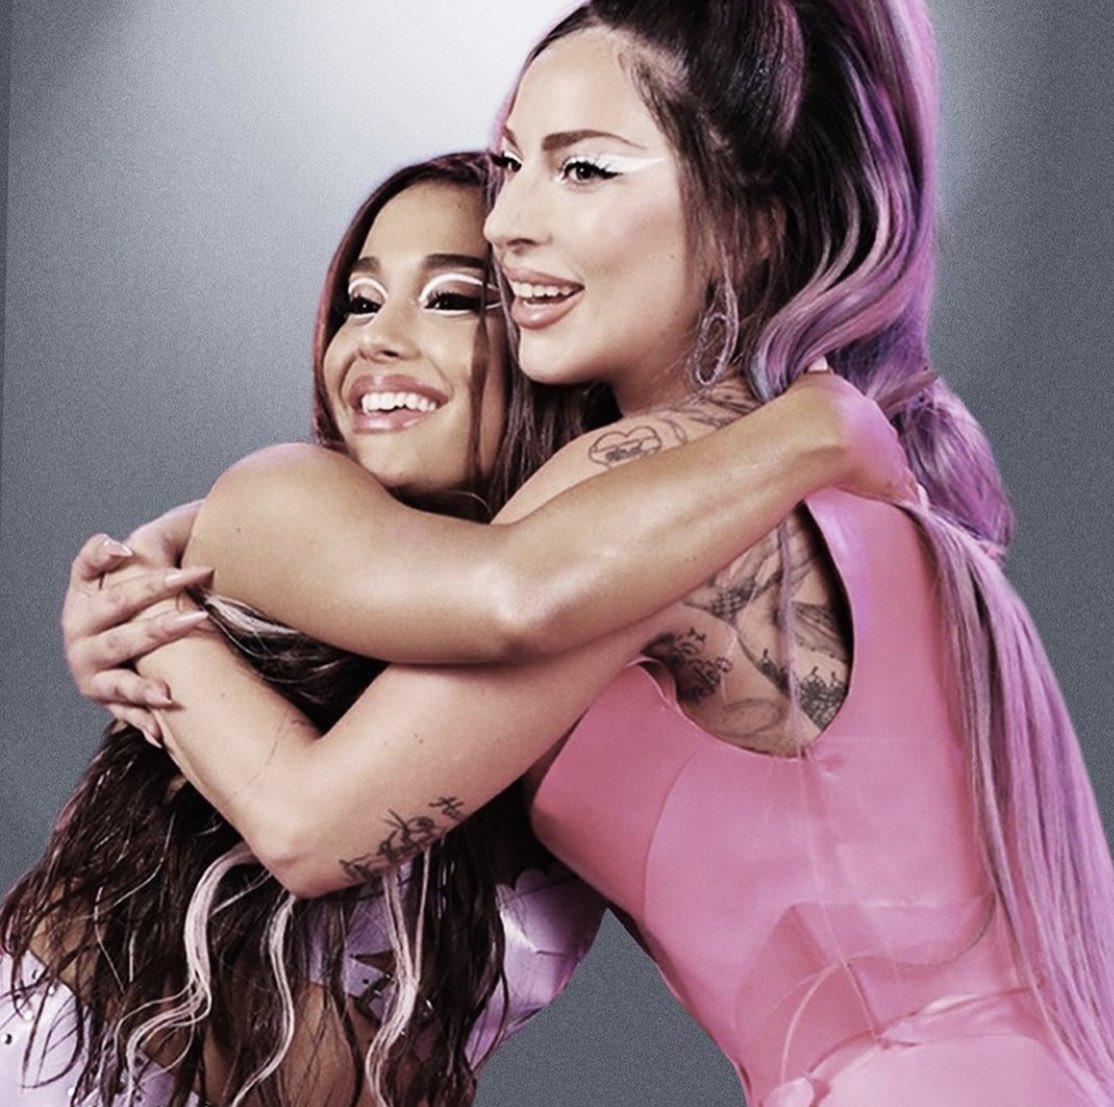 ariana gaga - 10 лучших дуэтов Lady Gaga по версии Billboard